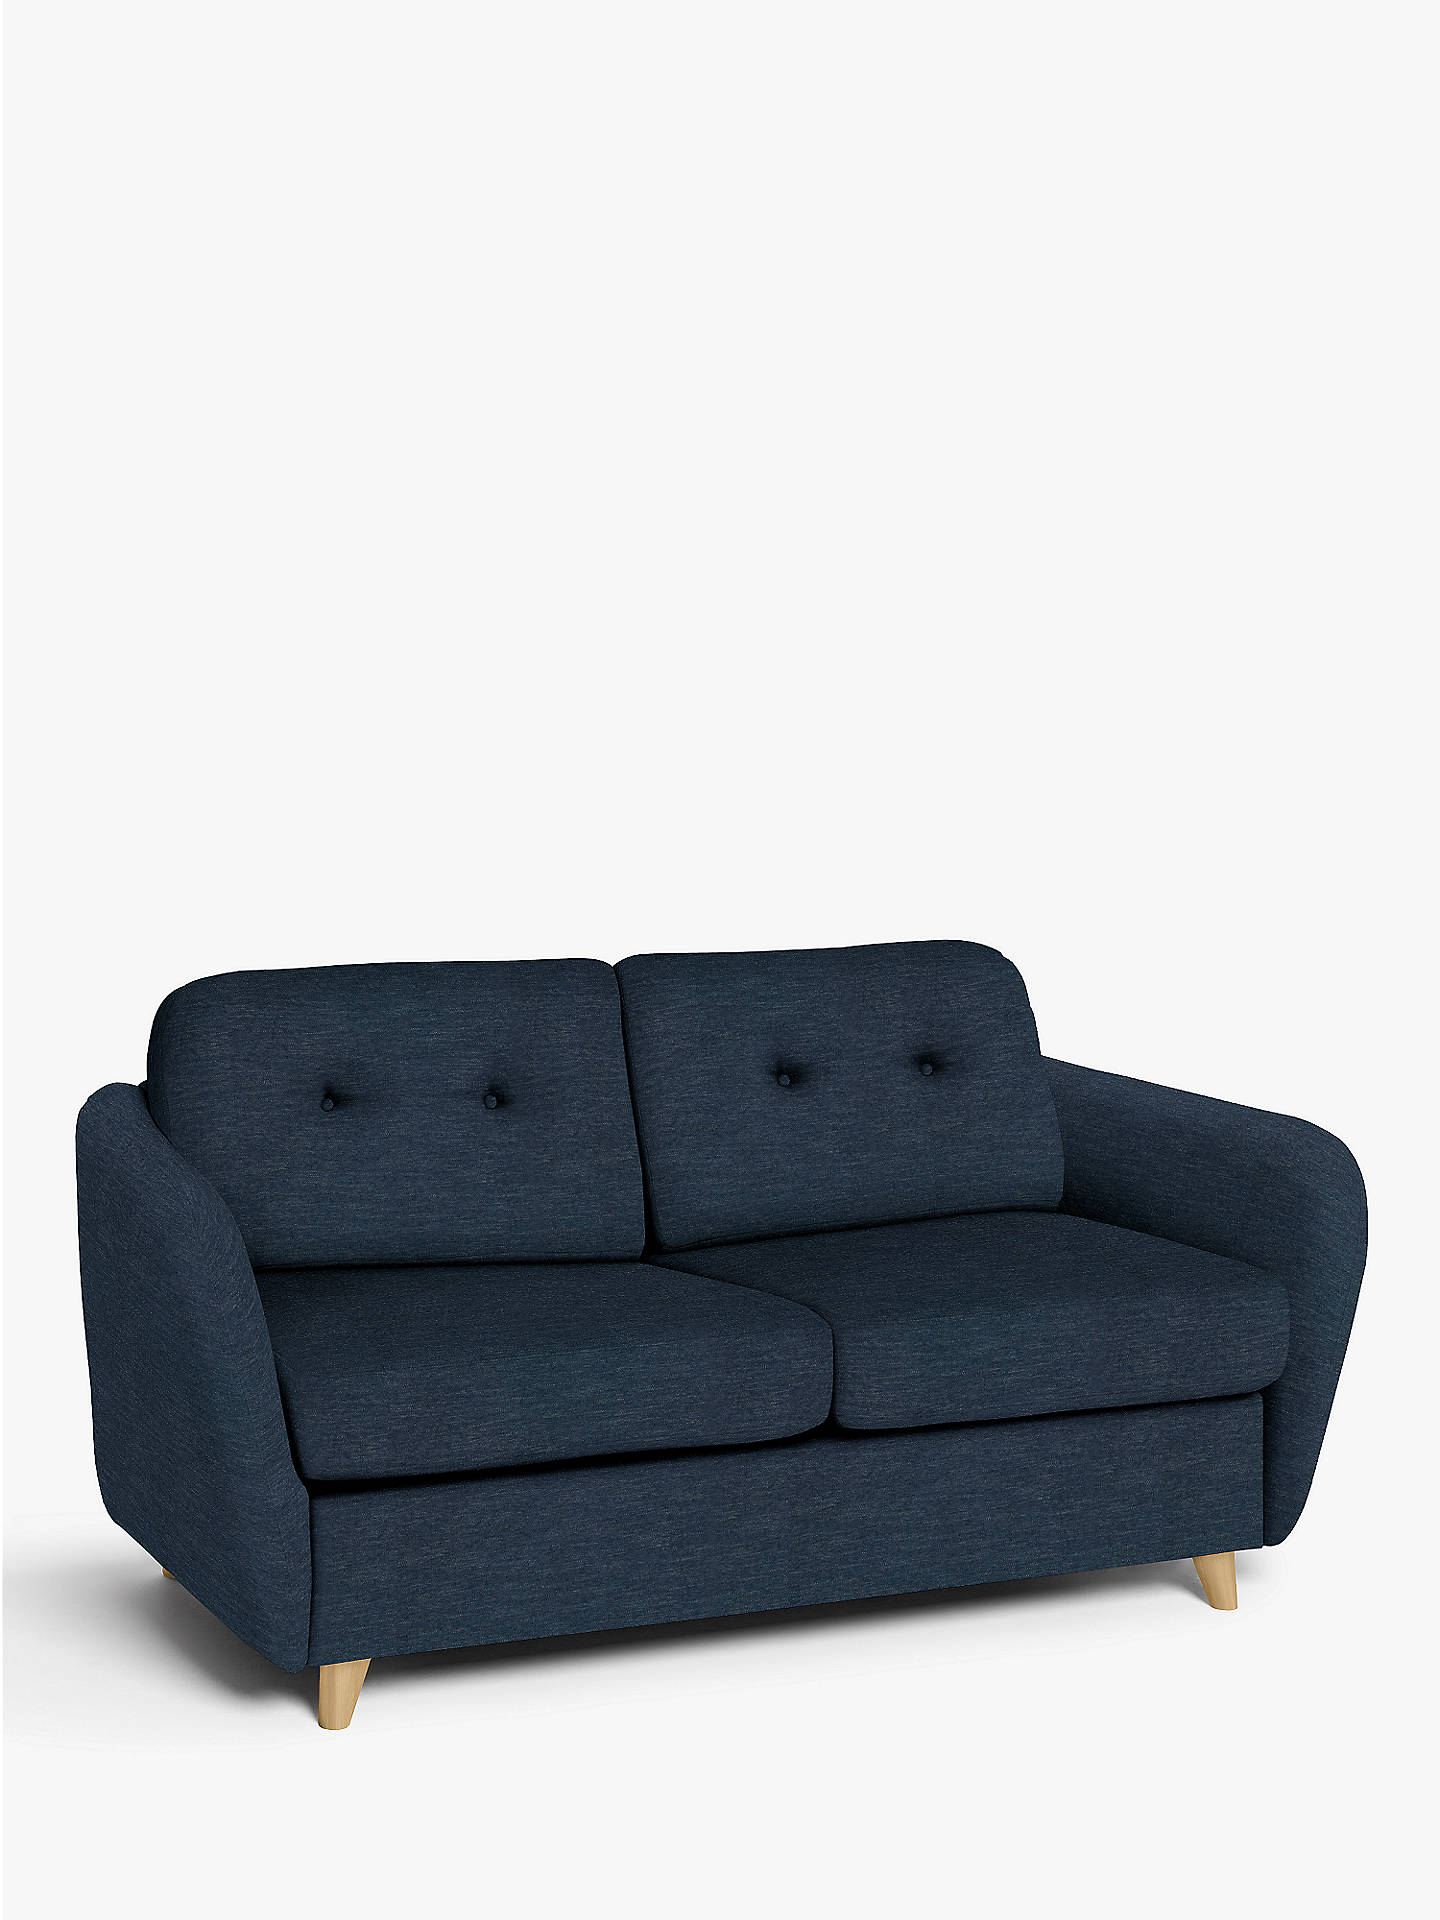 Strange House By John Lewis Arlo Sofa Bed Light Leg Erin Midnight Cjindustries Chair Design For Home Cjindustriesco